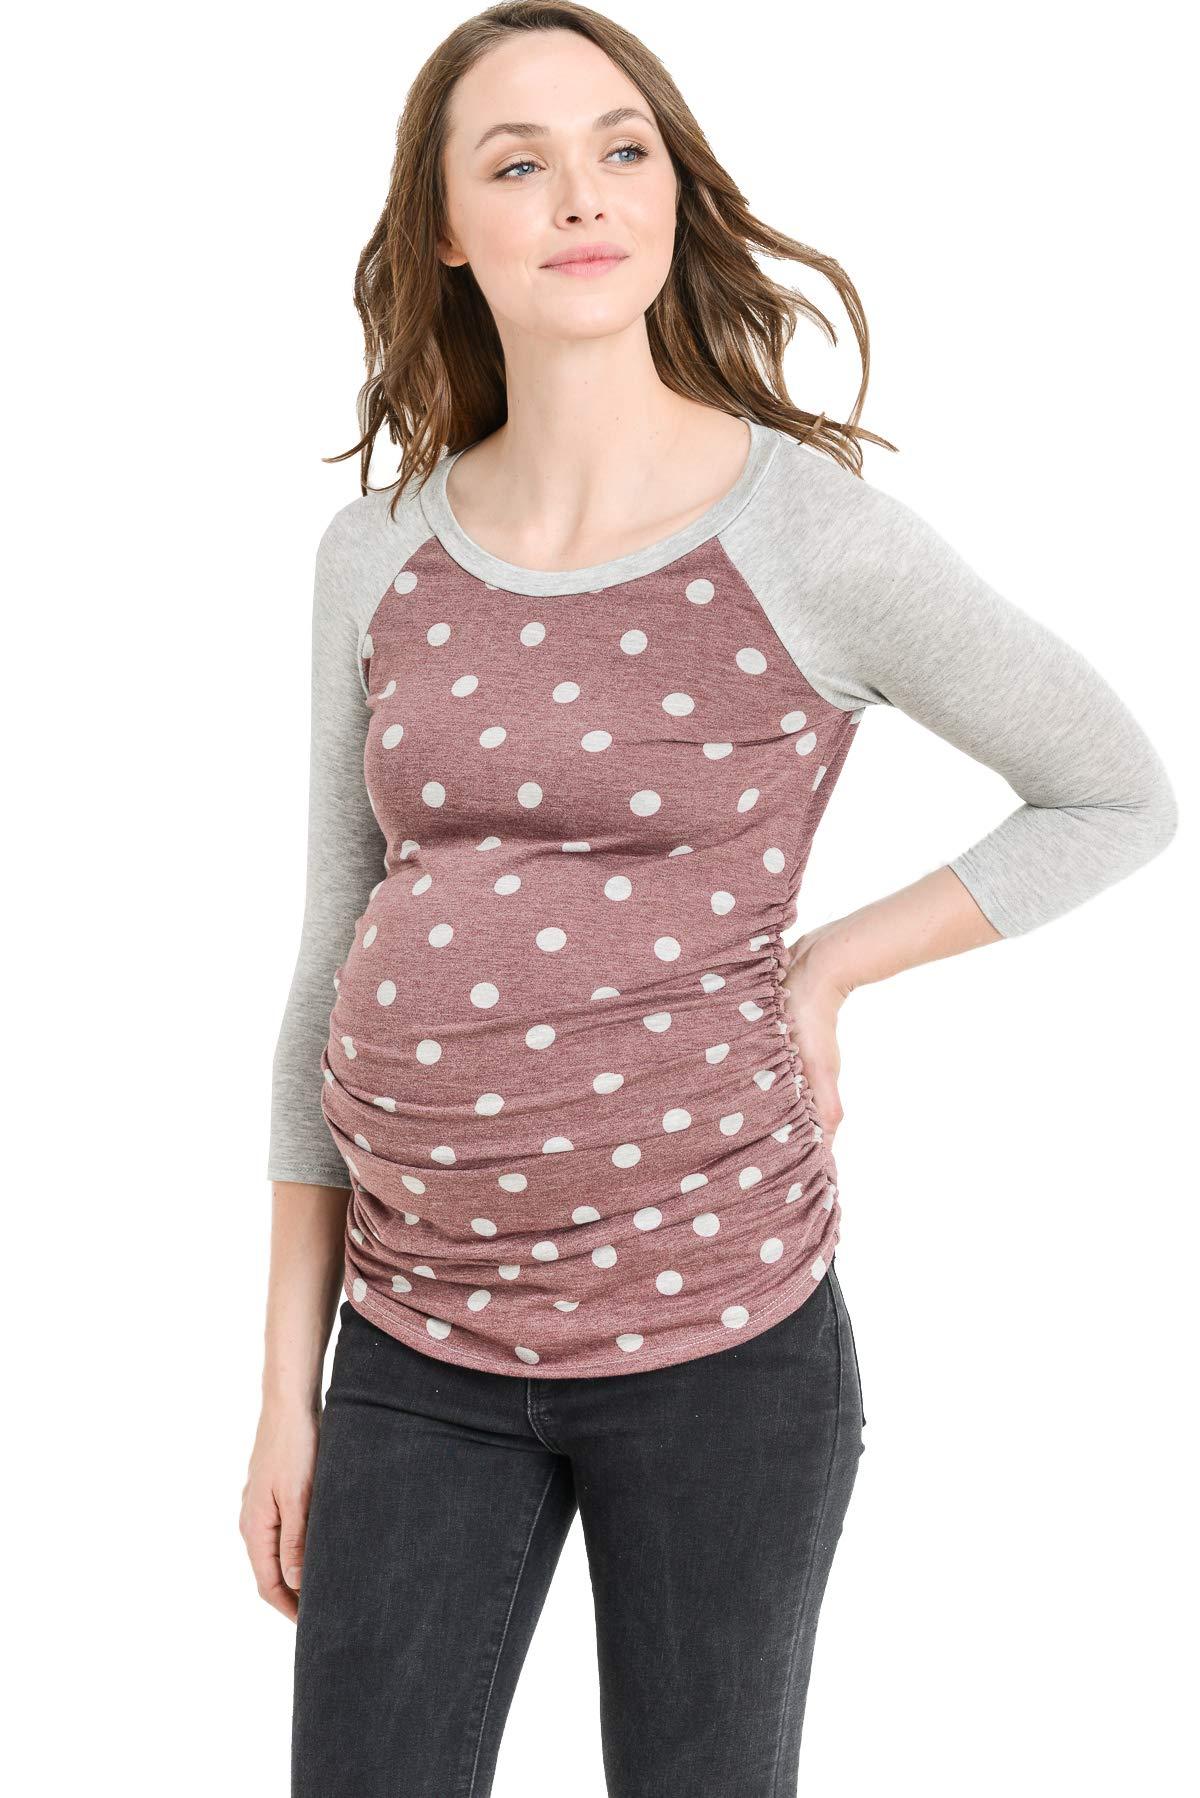 Hello MIZ Women's Baseball Crew Neck Flower Raglan Sleeve Maternity T-Shirt Top (Burgundy Dot/H Grey, L)